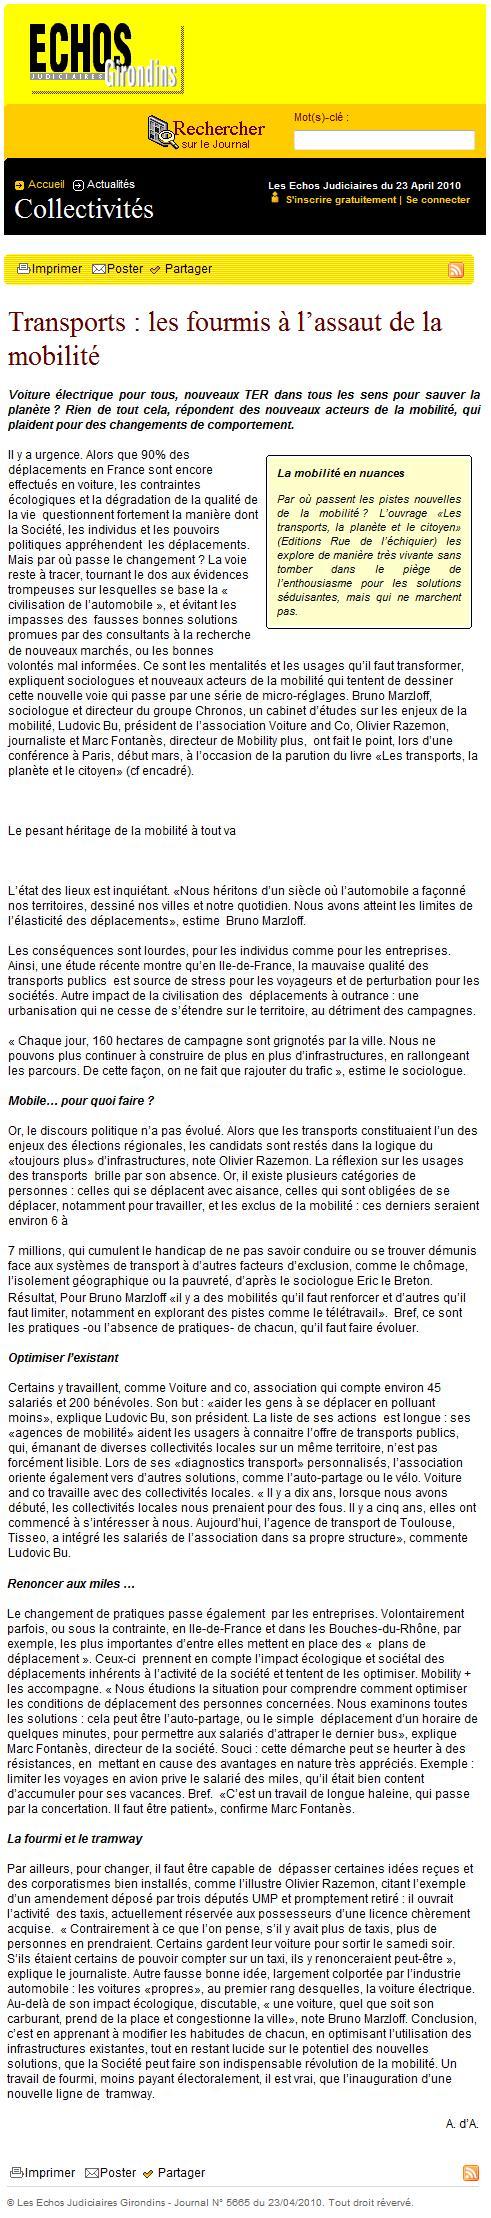 Echos Judiciaires Girondins (23 avril 2010)